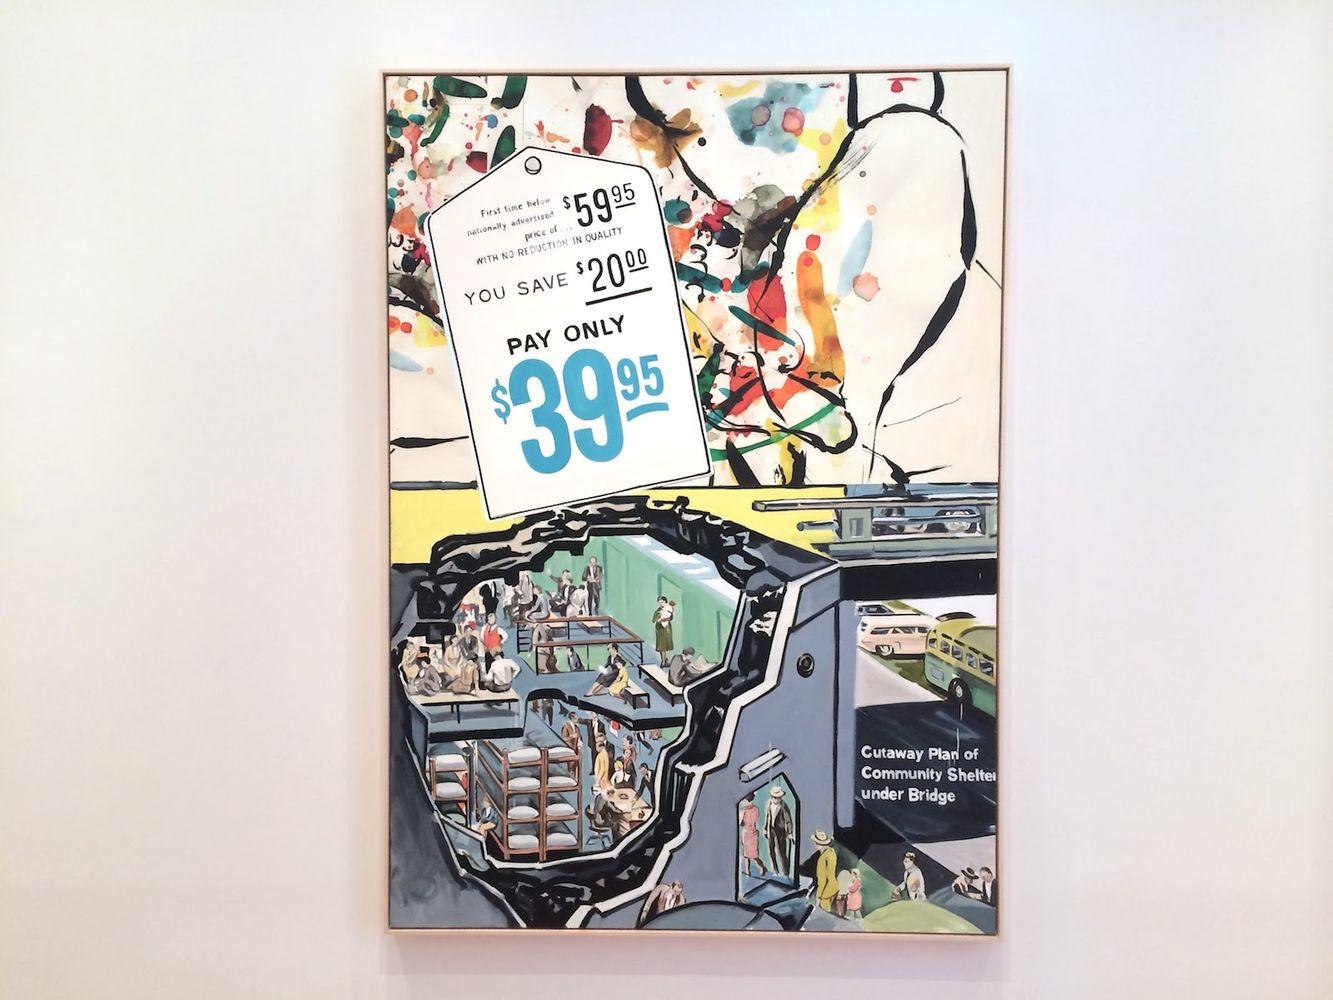 Upper East Side Art Galleries - Skarstedt Gallery, NYC